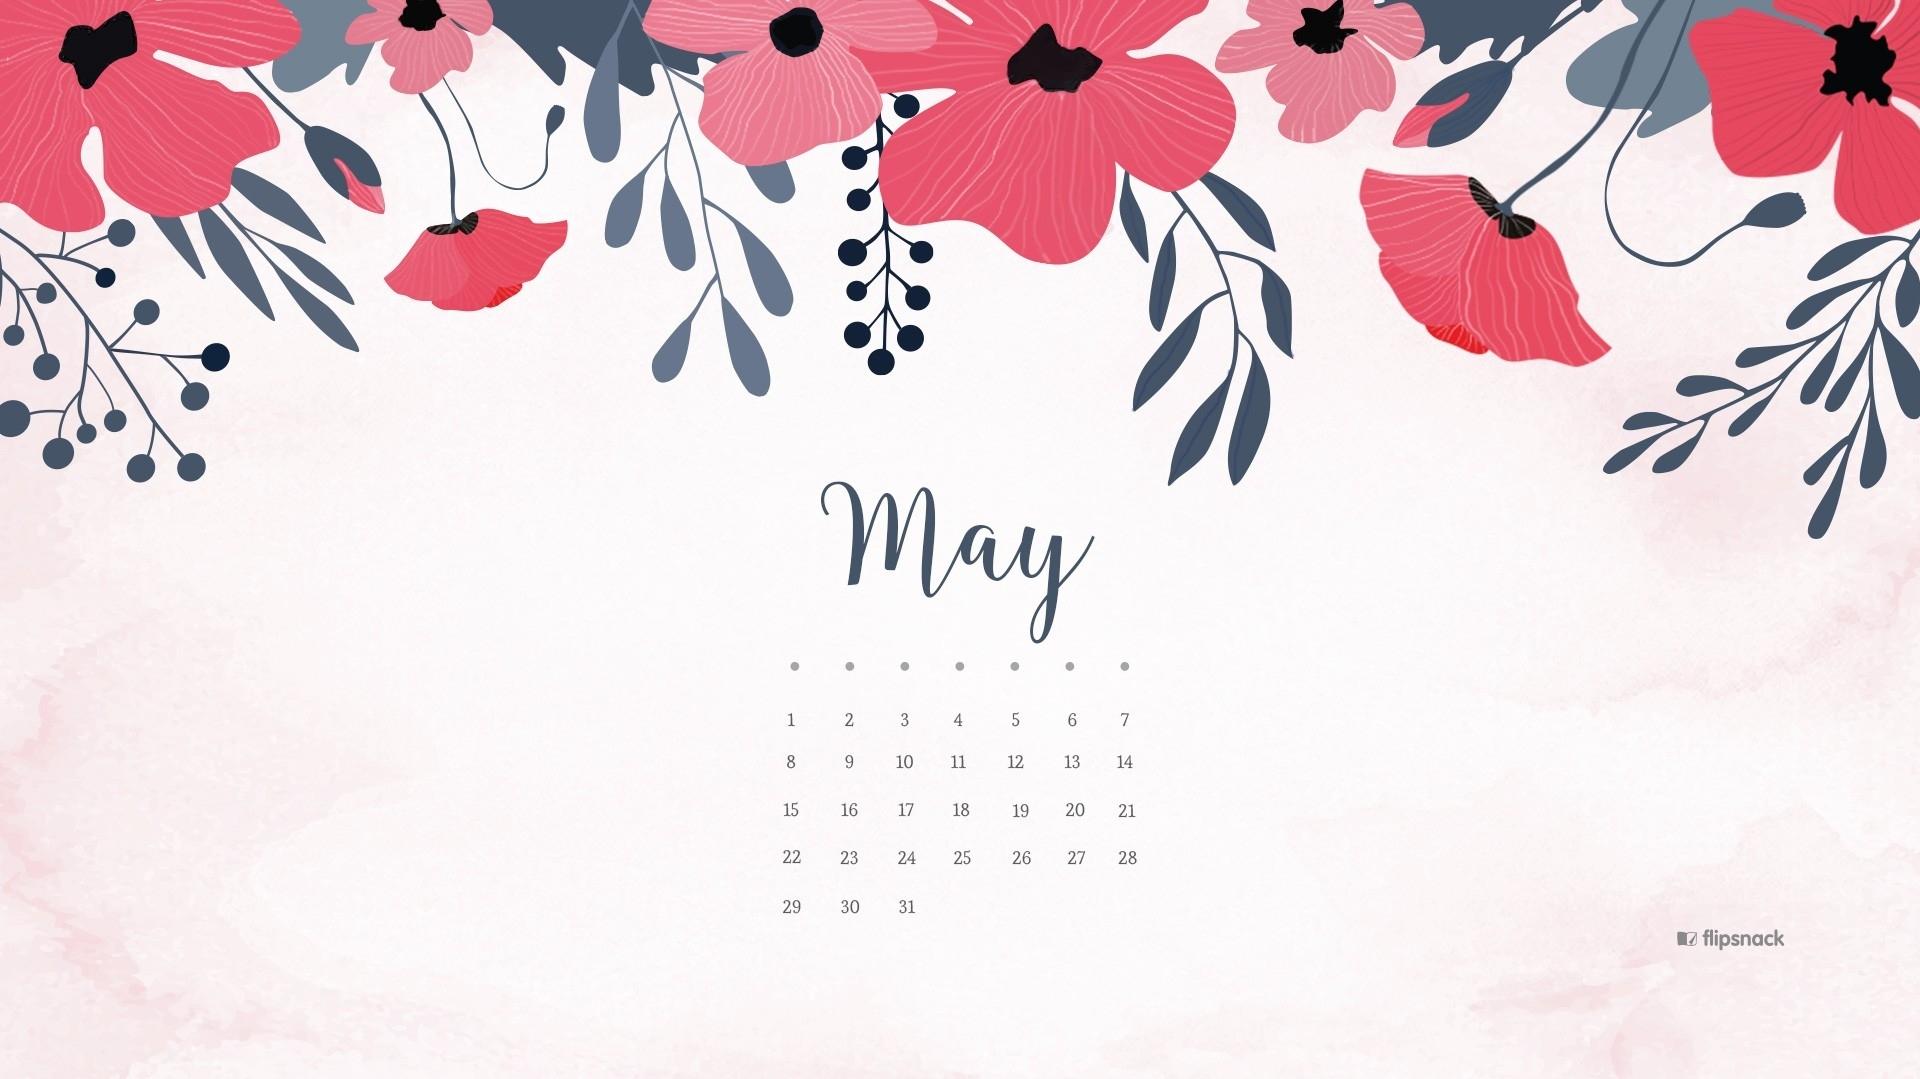 may 2017 calendar wallpaper 1280x1024 - wallpaper rocket